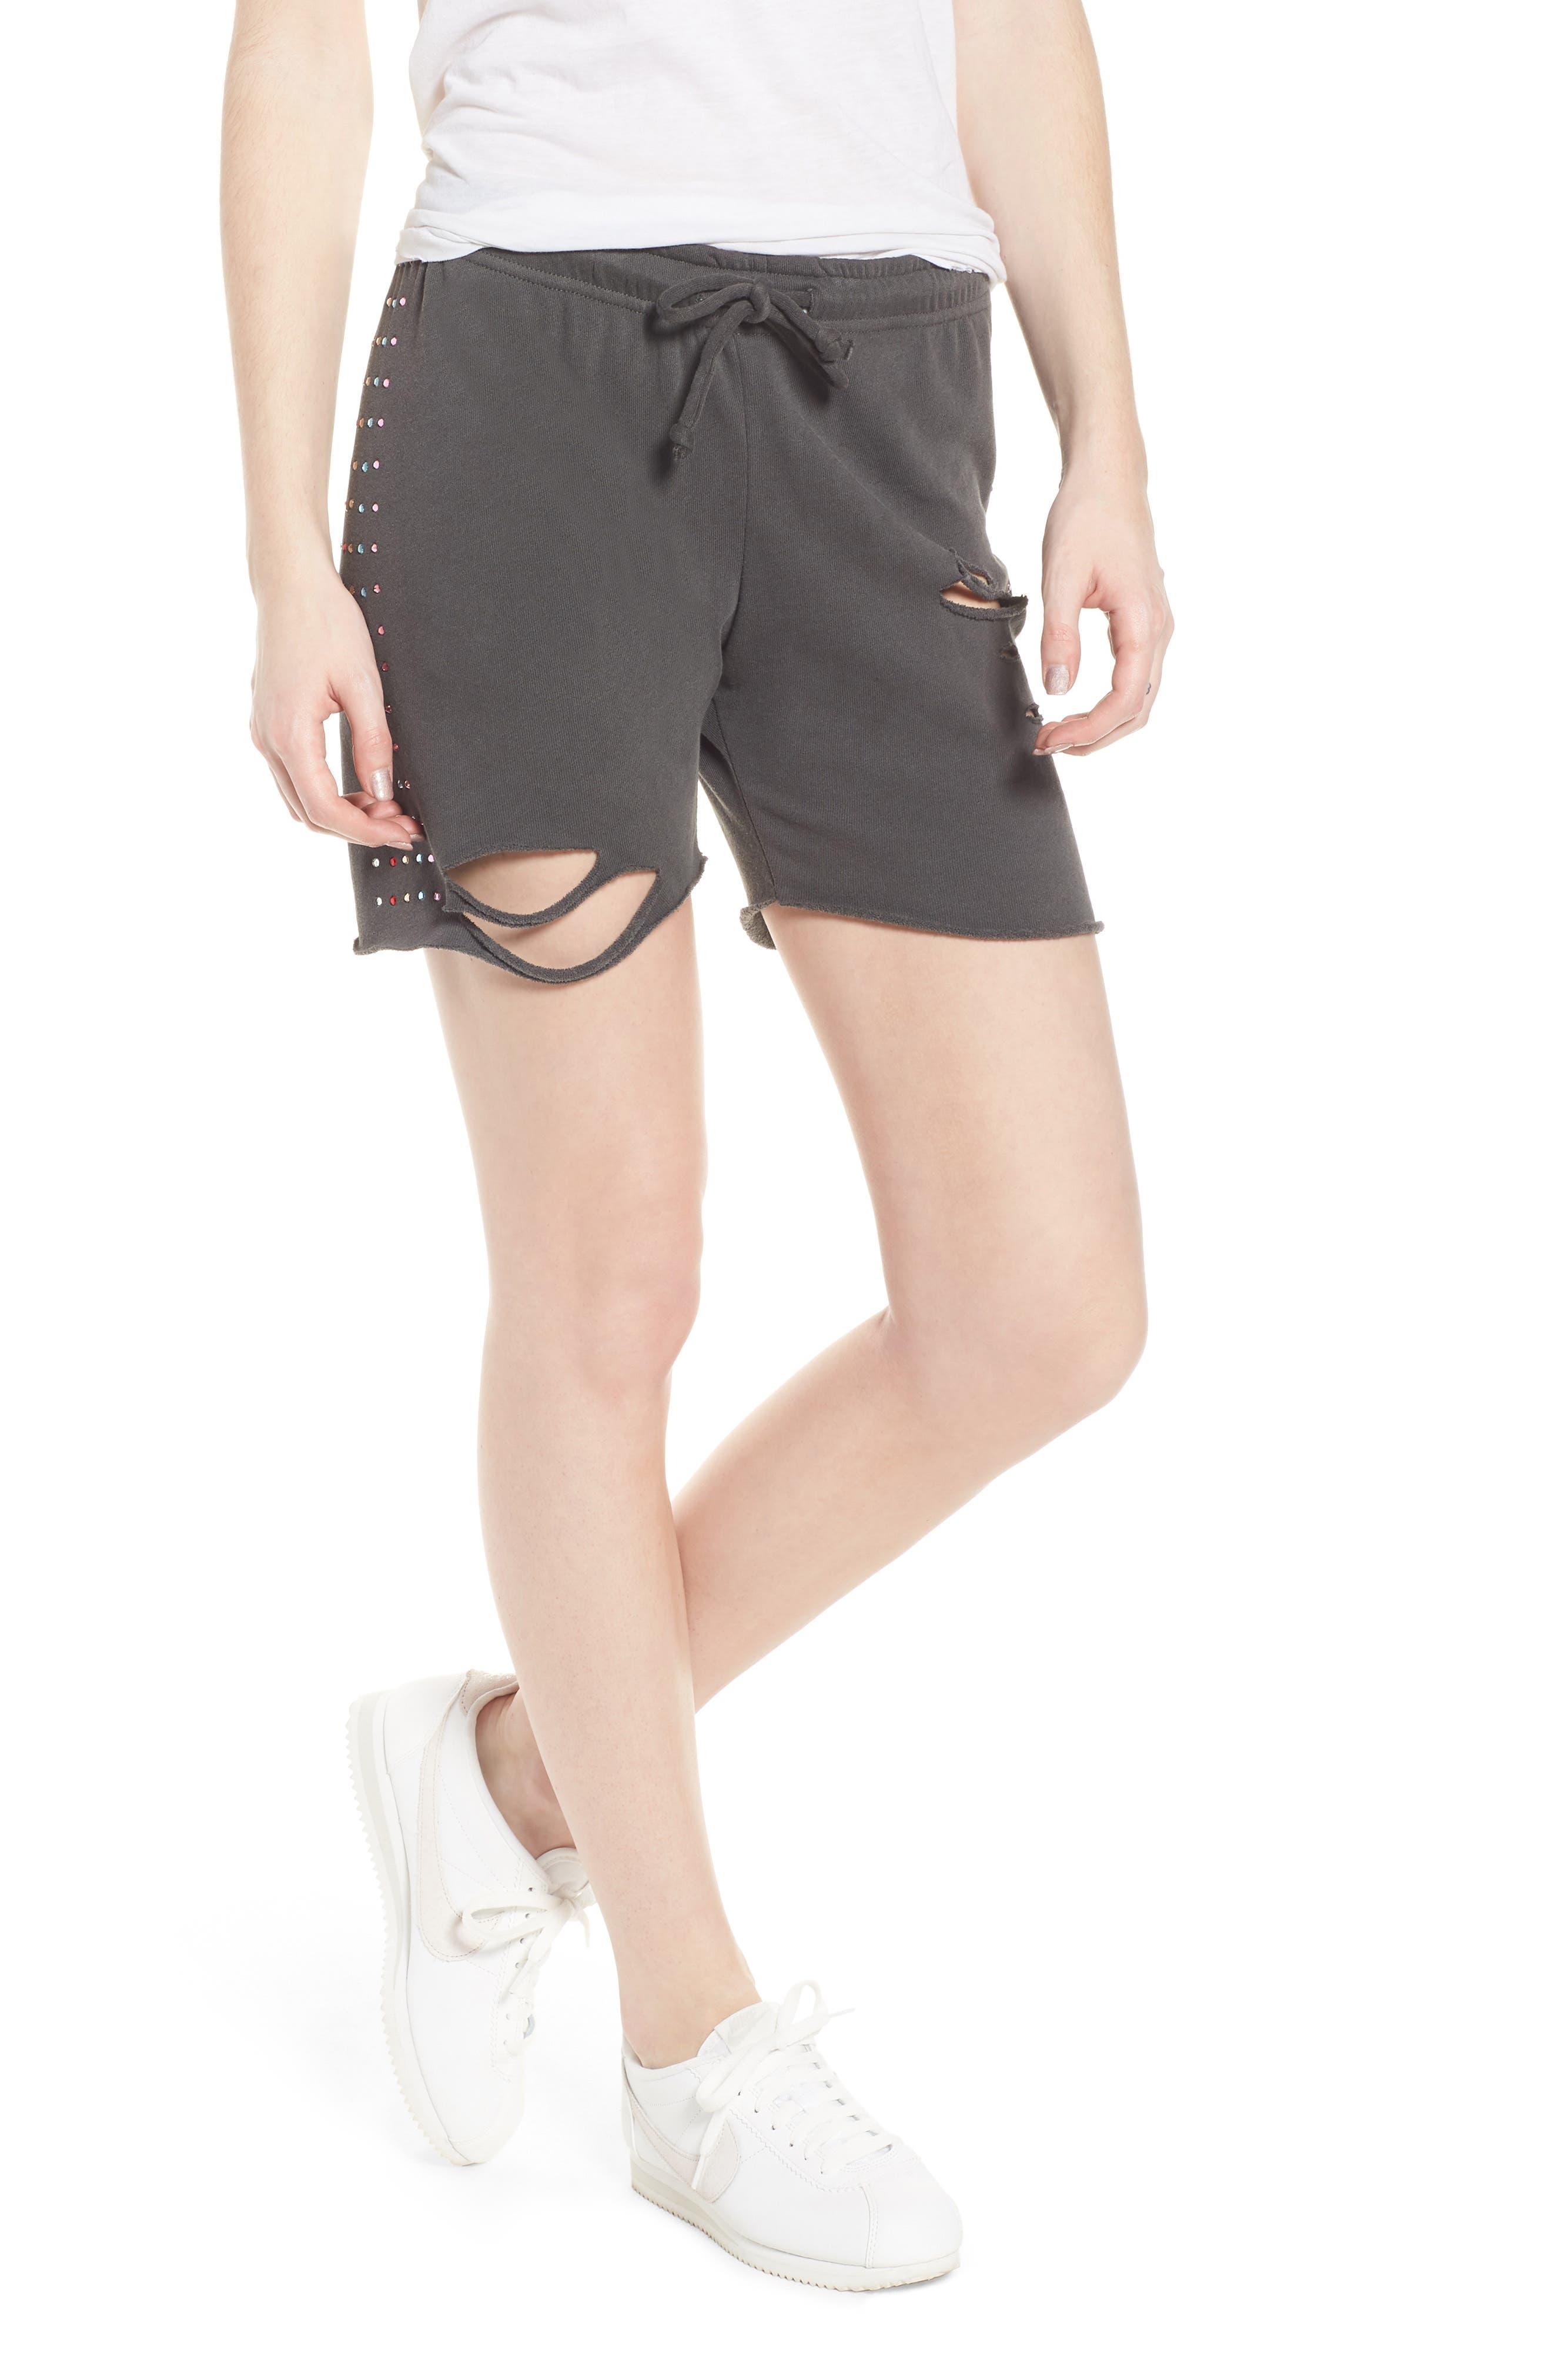 Rainbow Glitz Shorts,                             Main thumbnail 1, color,                             Pigment Black